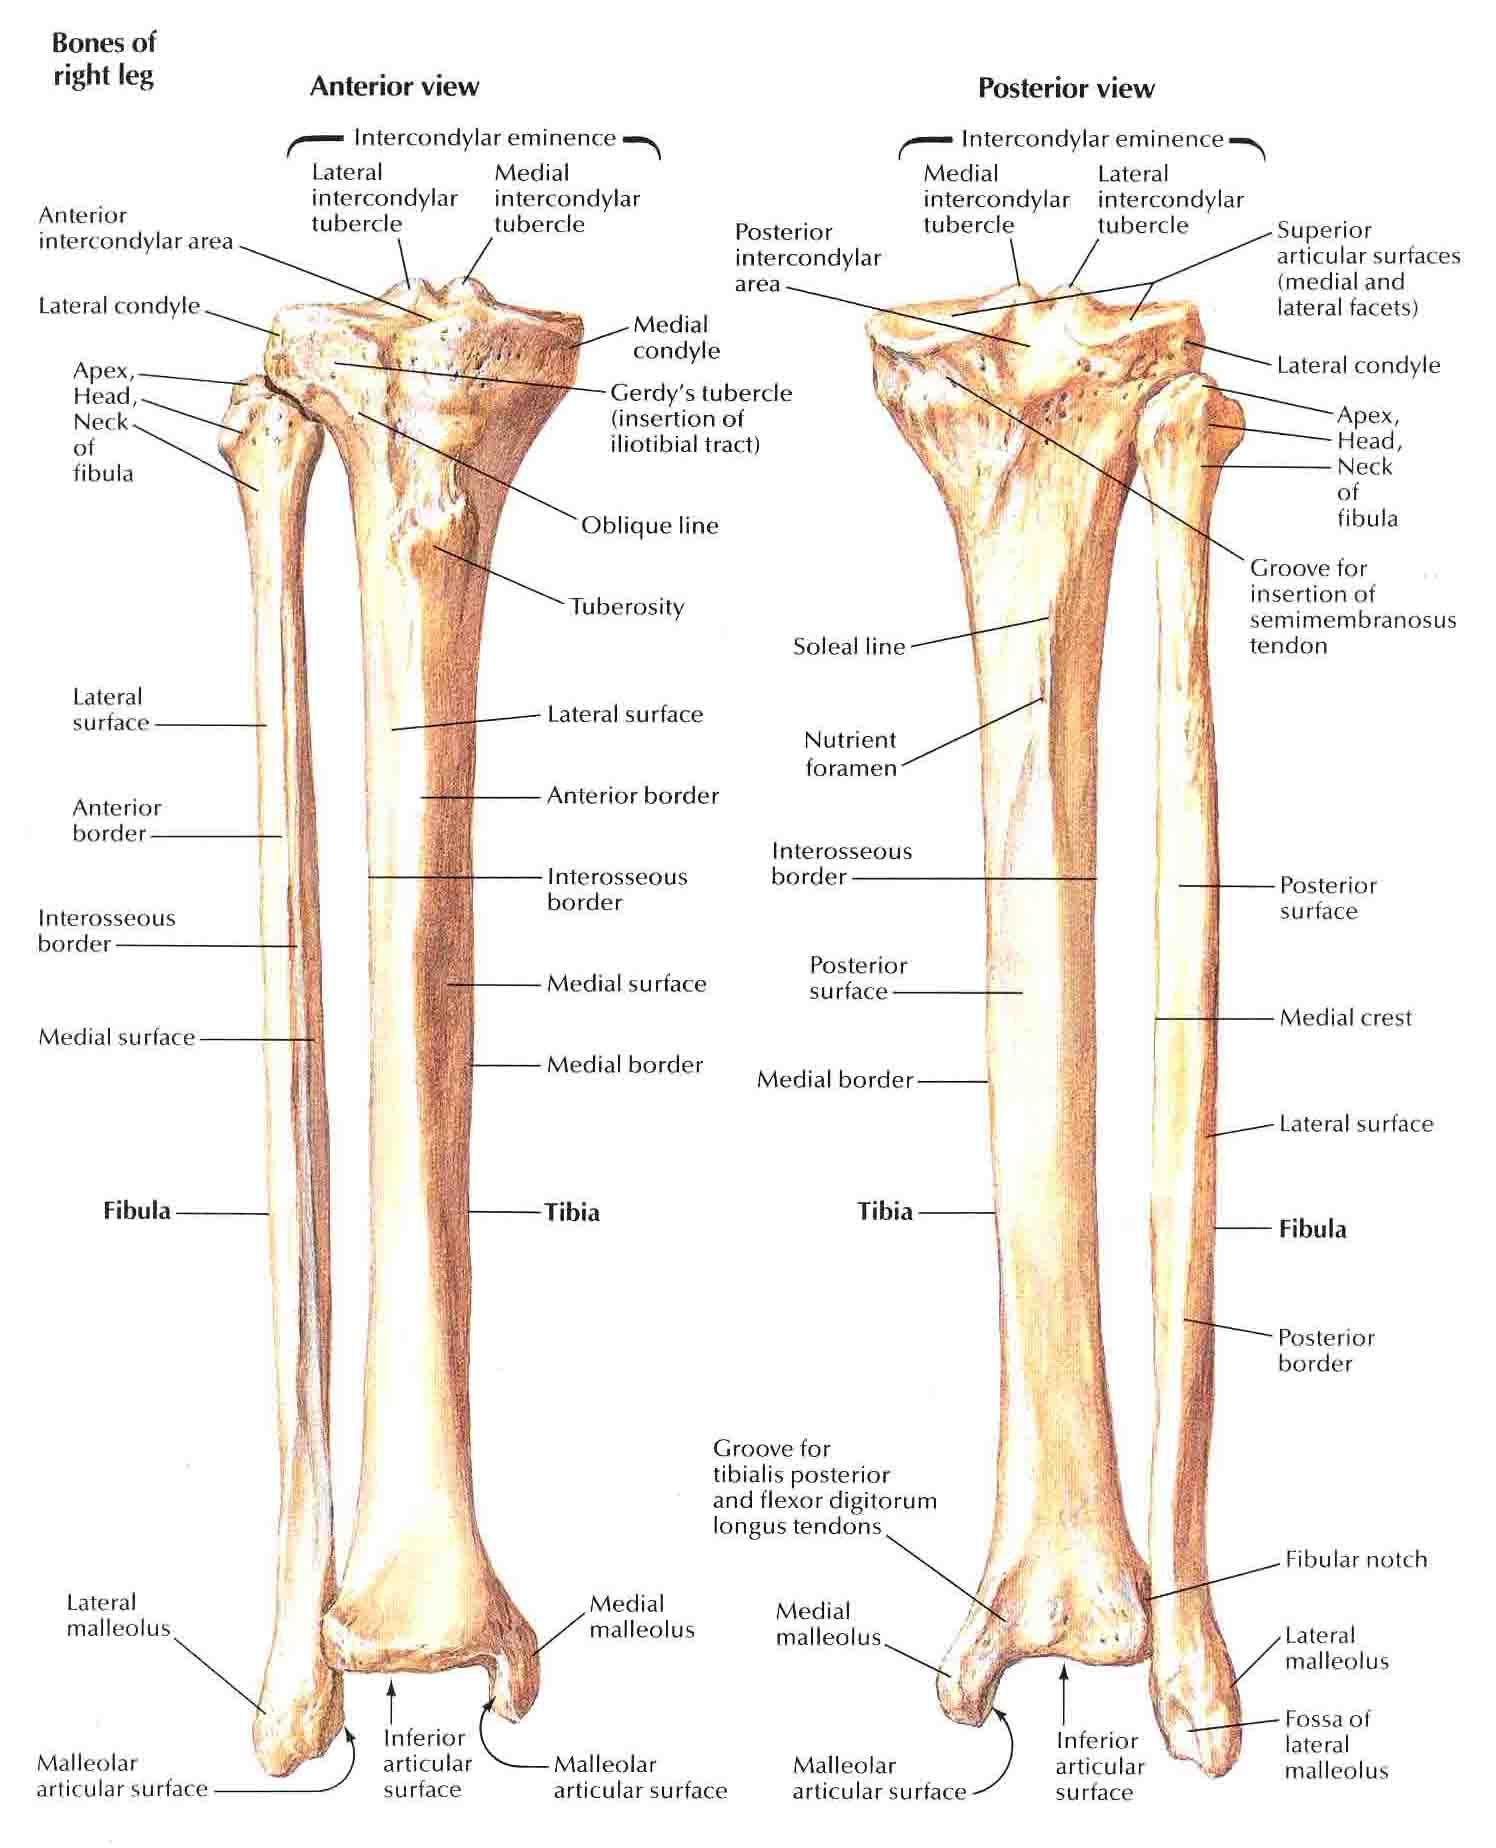 Tibia Vs Fibula PictureFibular Notch Of Tibia